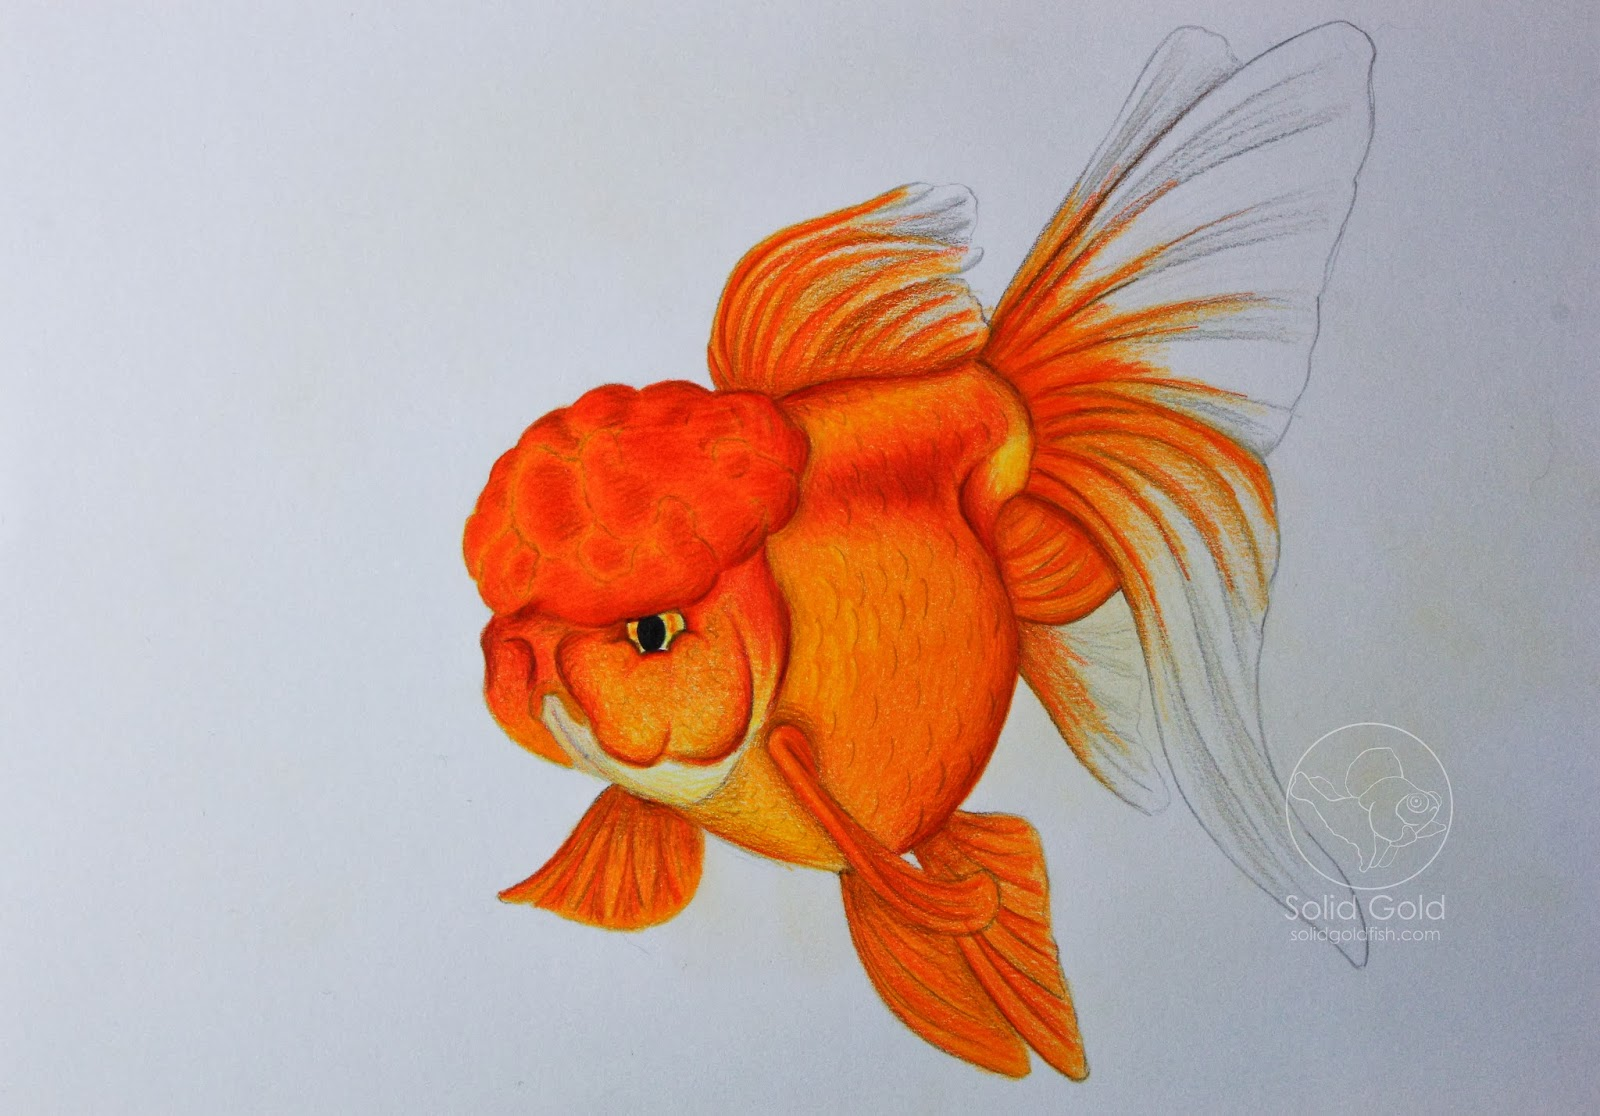 Drawn goldfish fancy goldfish Gold: An Solid Gold error